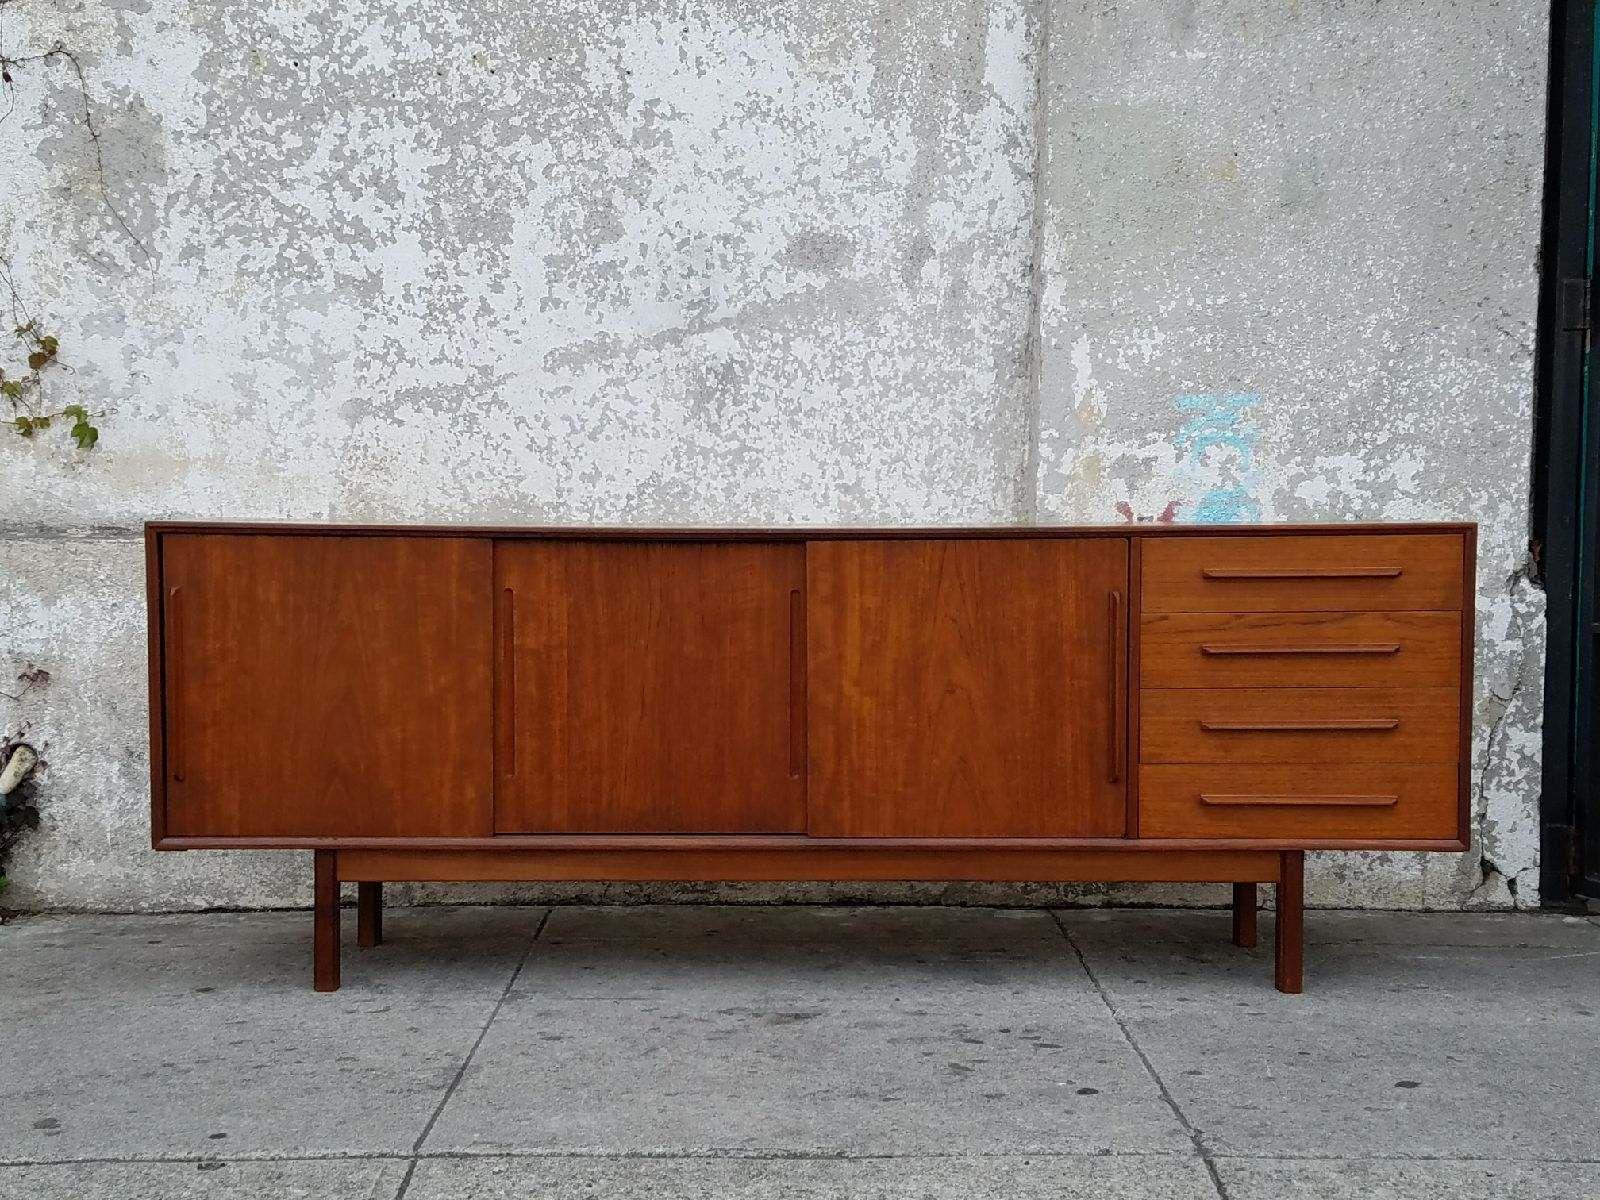 Teak Danish Credenza : Vintage danish teak mid century credenza sideboard